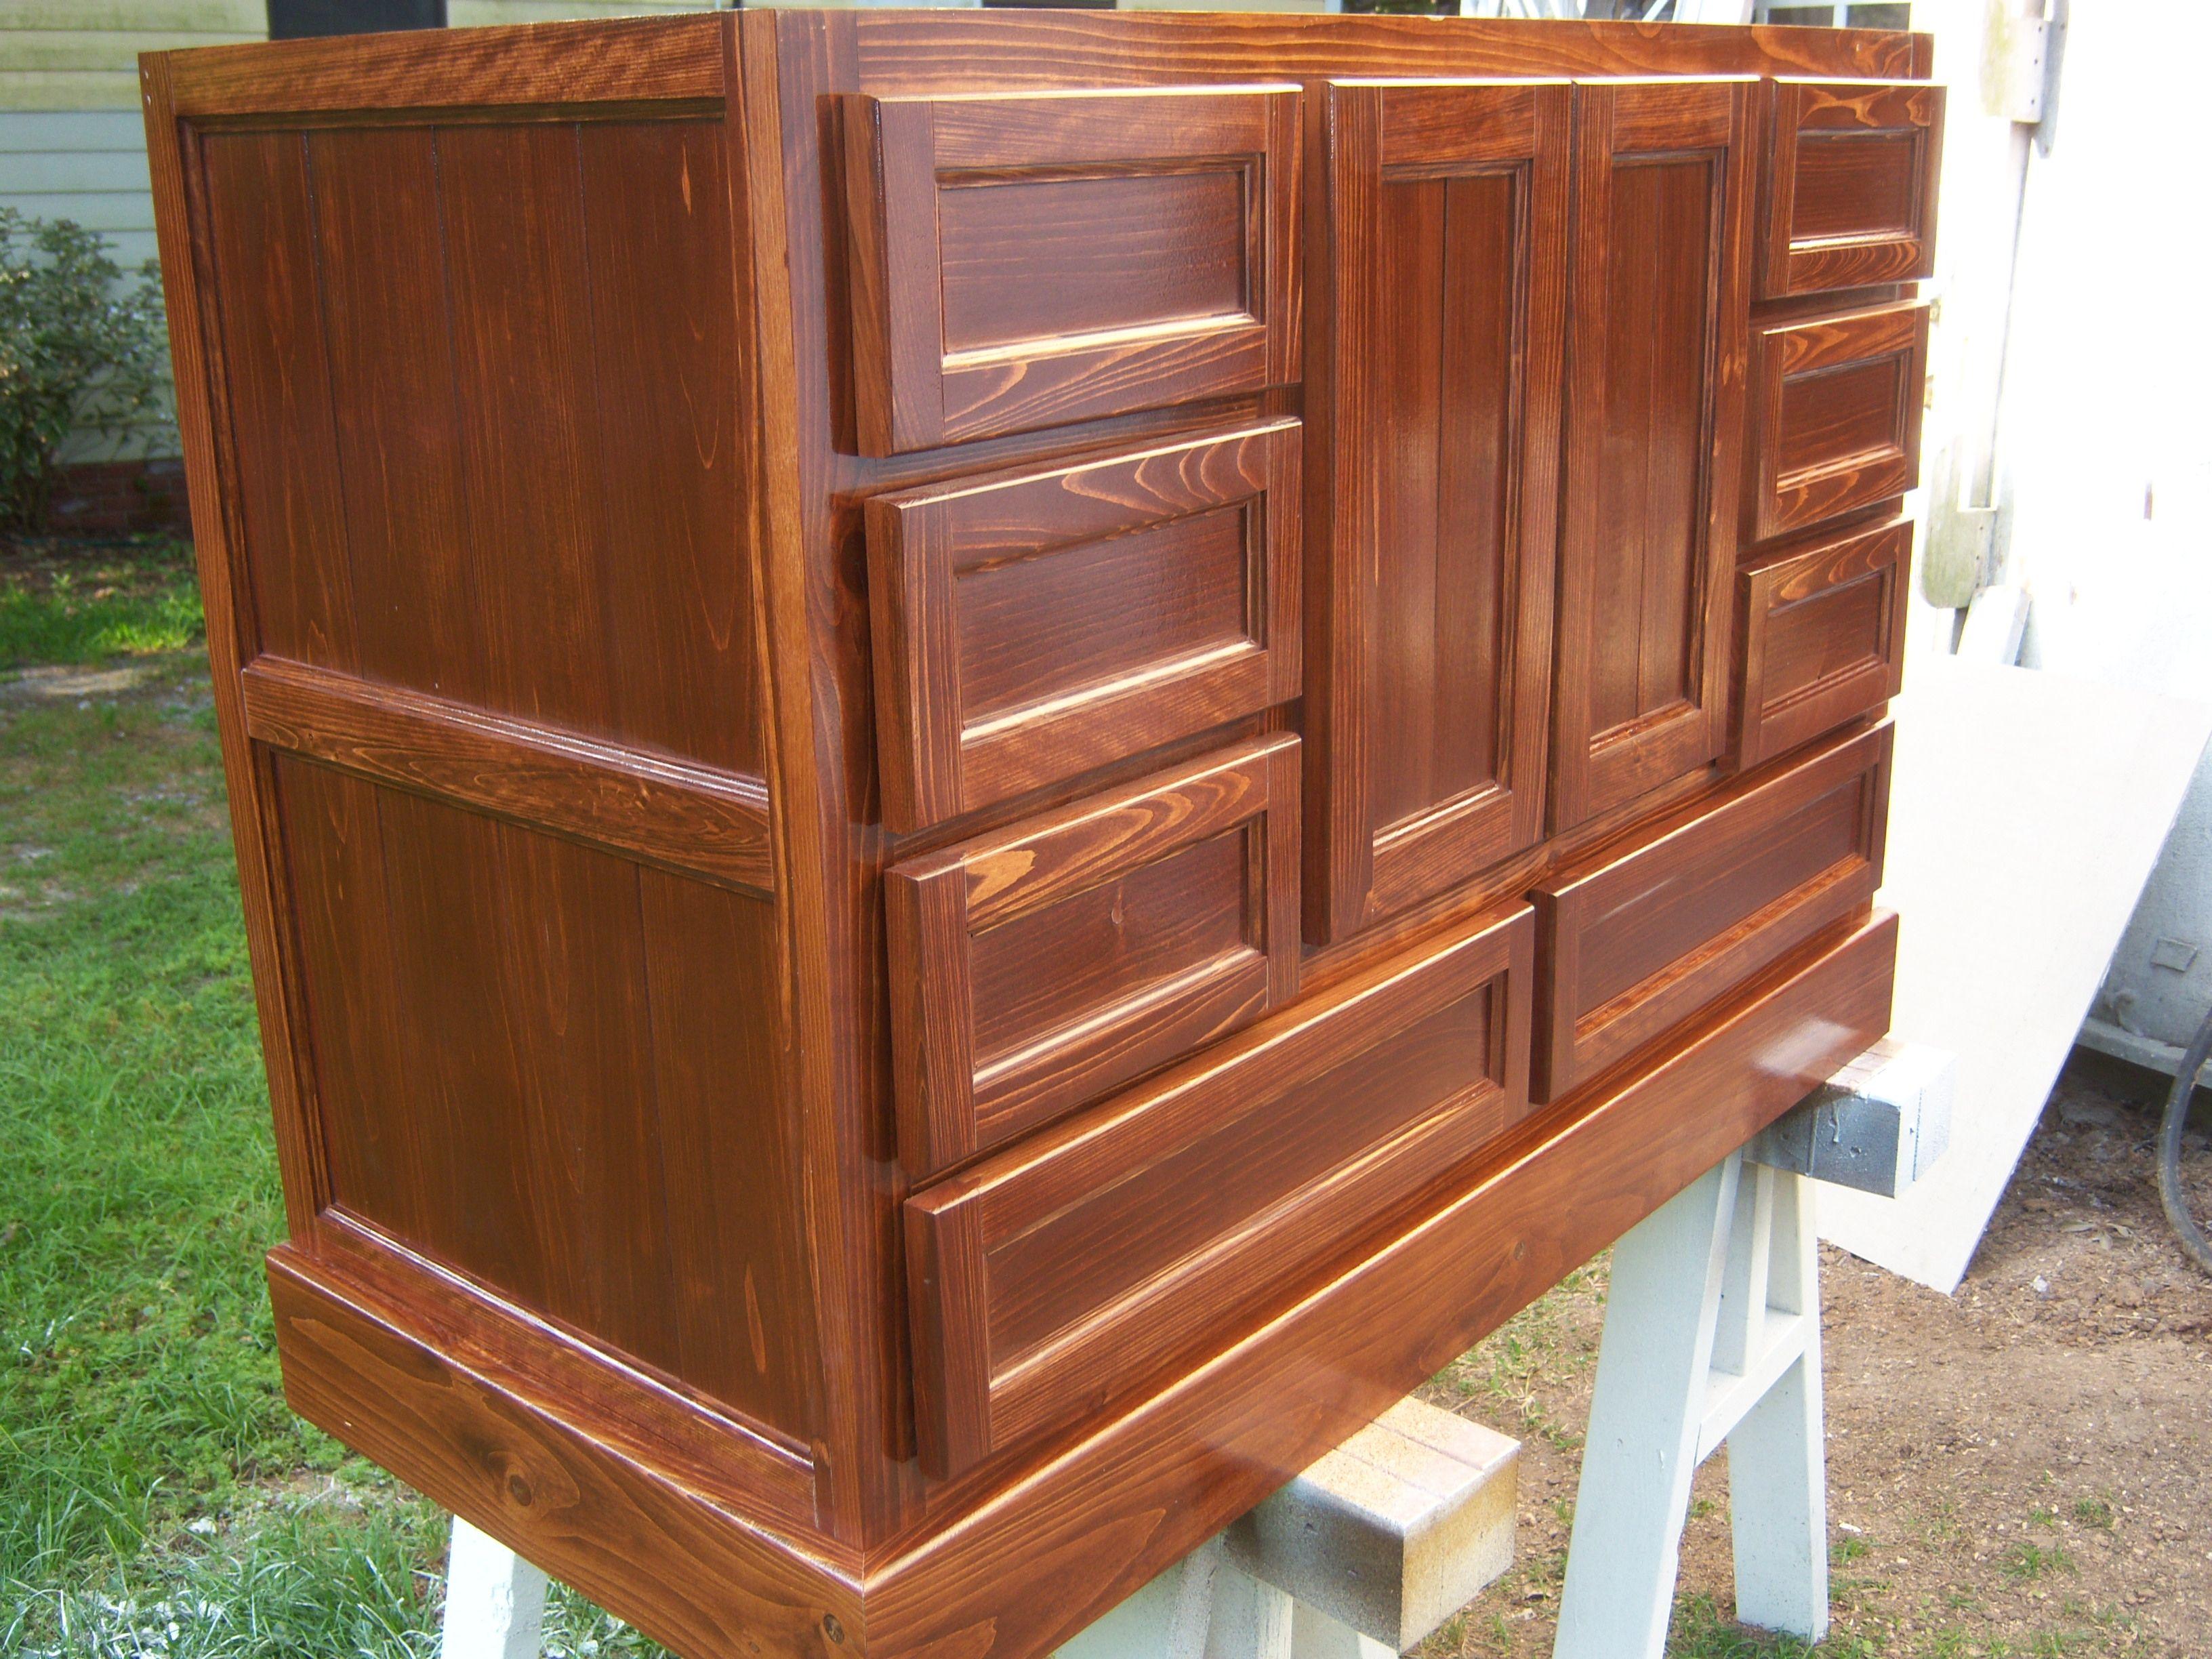 Cypress vanity cabinet | Cypress wood, Wood cabinets ...